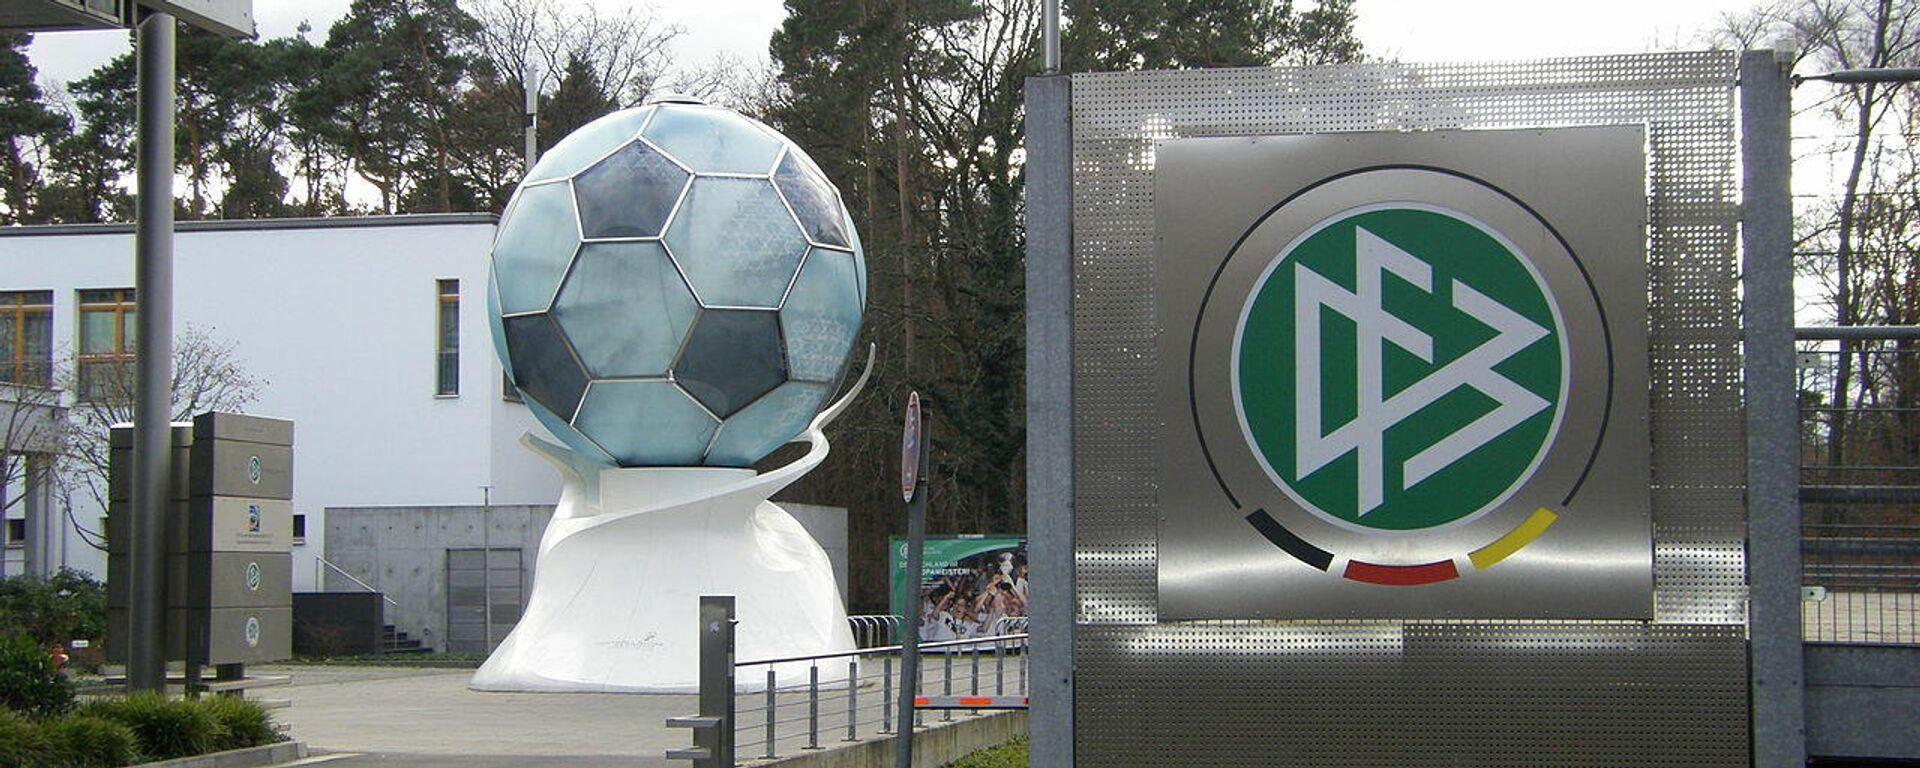 Zentrale des DFB in Frankfurt am Main (Archivbild) - SNA, 1920, 14.07.2021